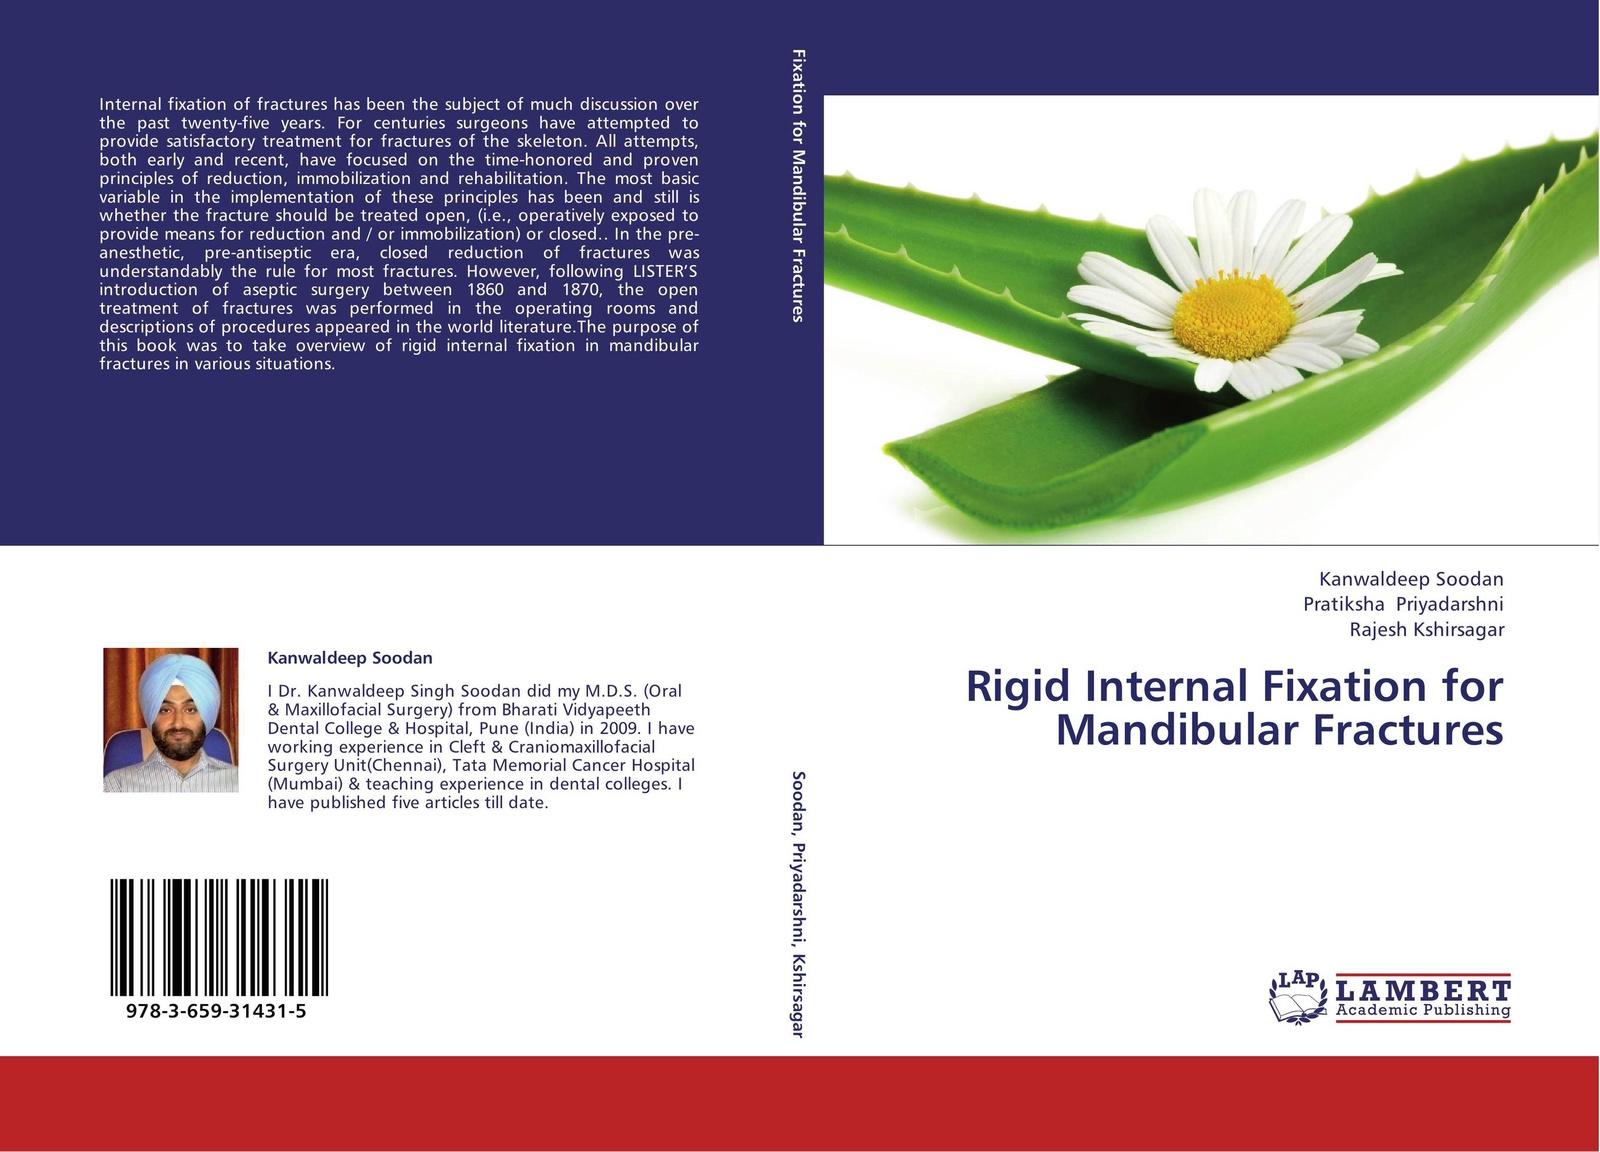 Kanwaldeep Soodan,Pratiksha Priyadarshni and Rajesh Kshirsagar Rigid Internal Fixation for Mandibular Fractures epidemiology of lower limb fractures and ambulatory rehabilitation